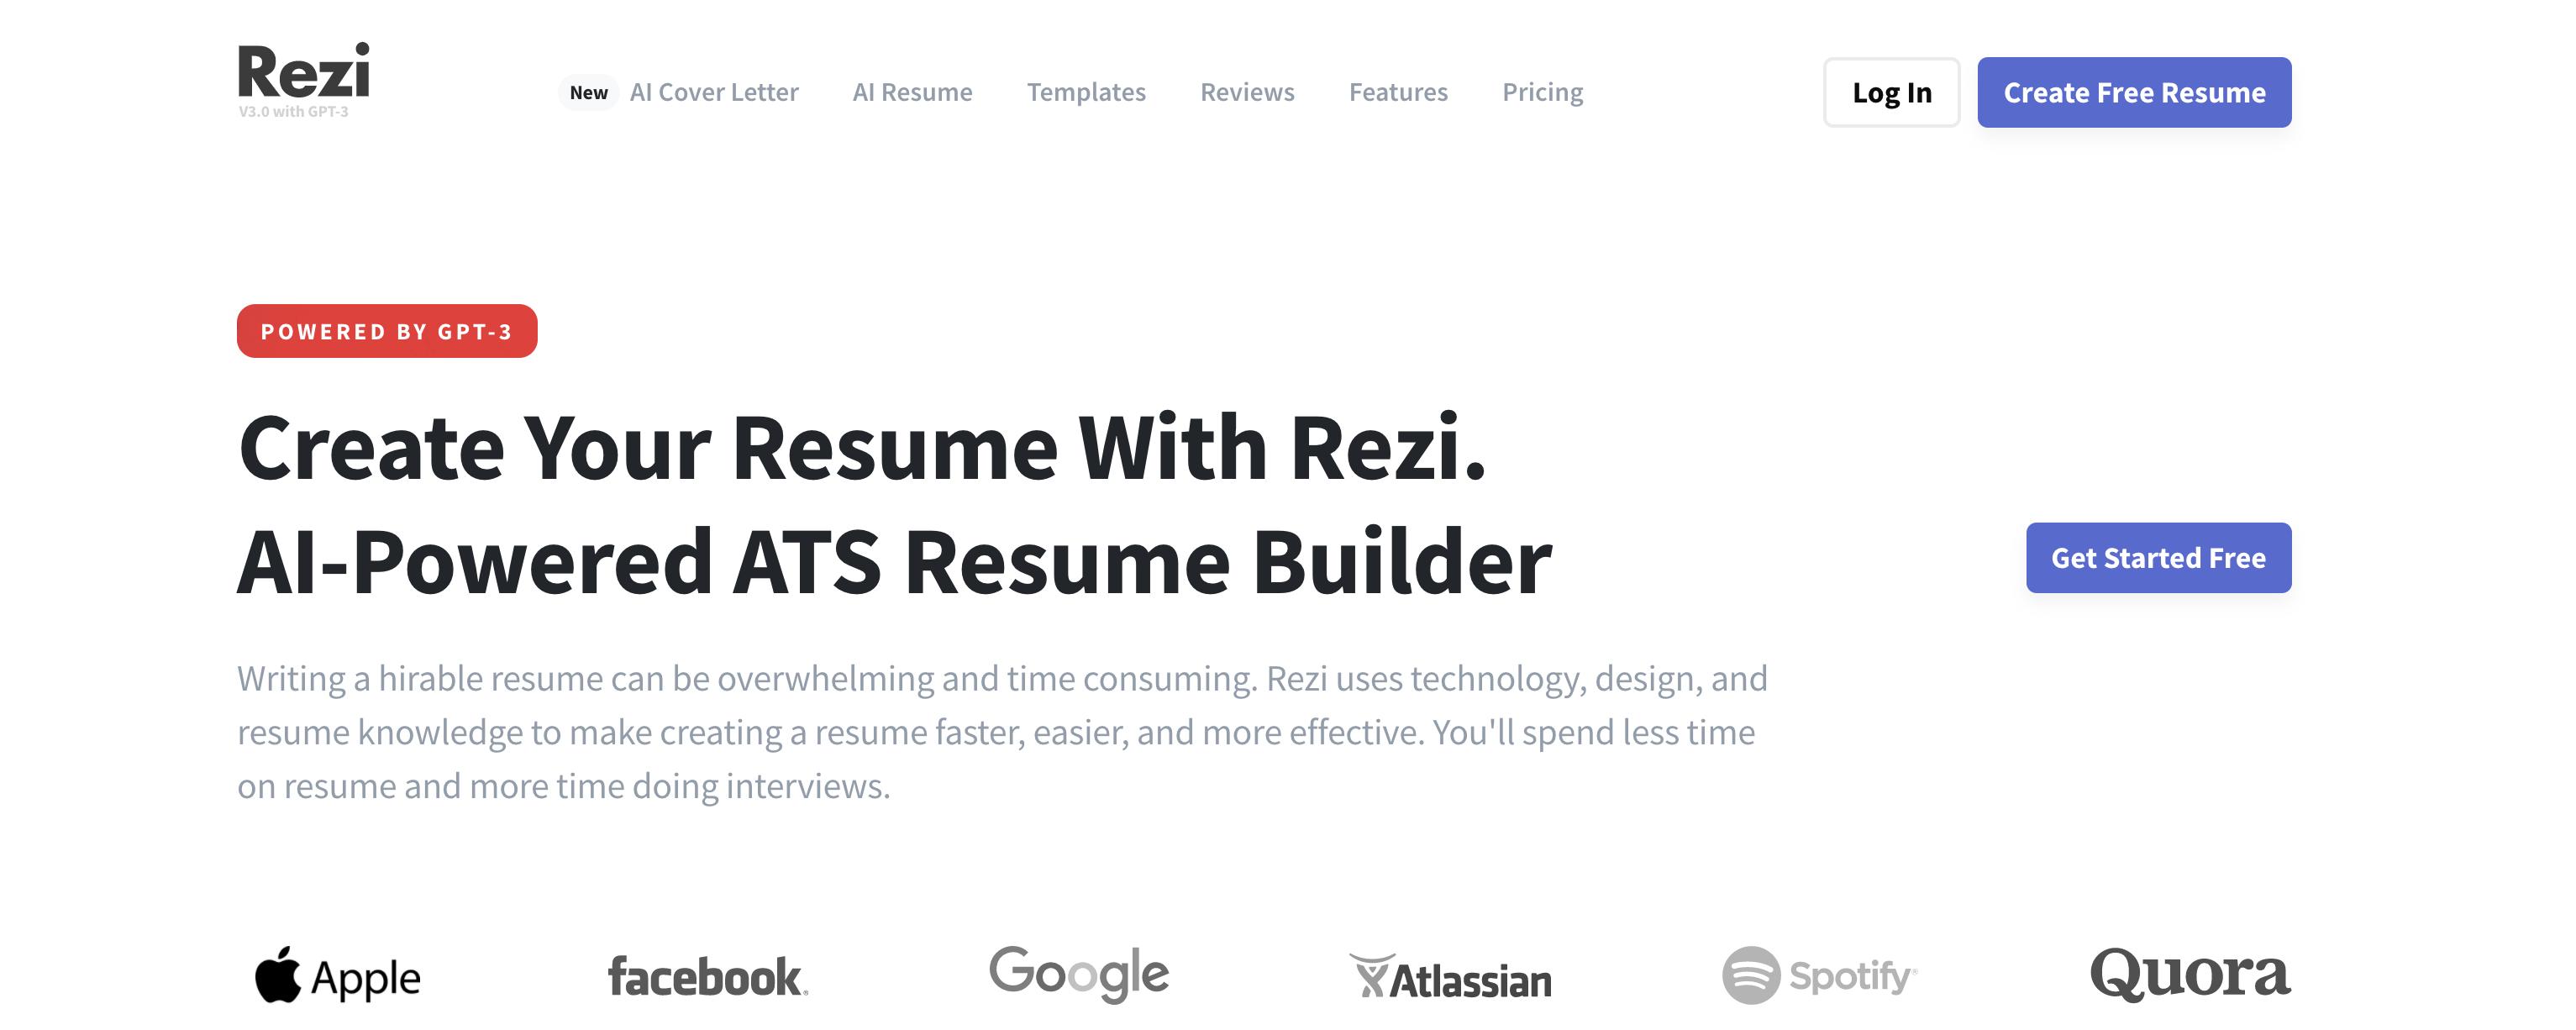 The Rezi Homepage